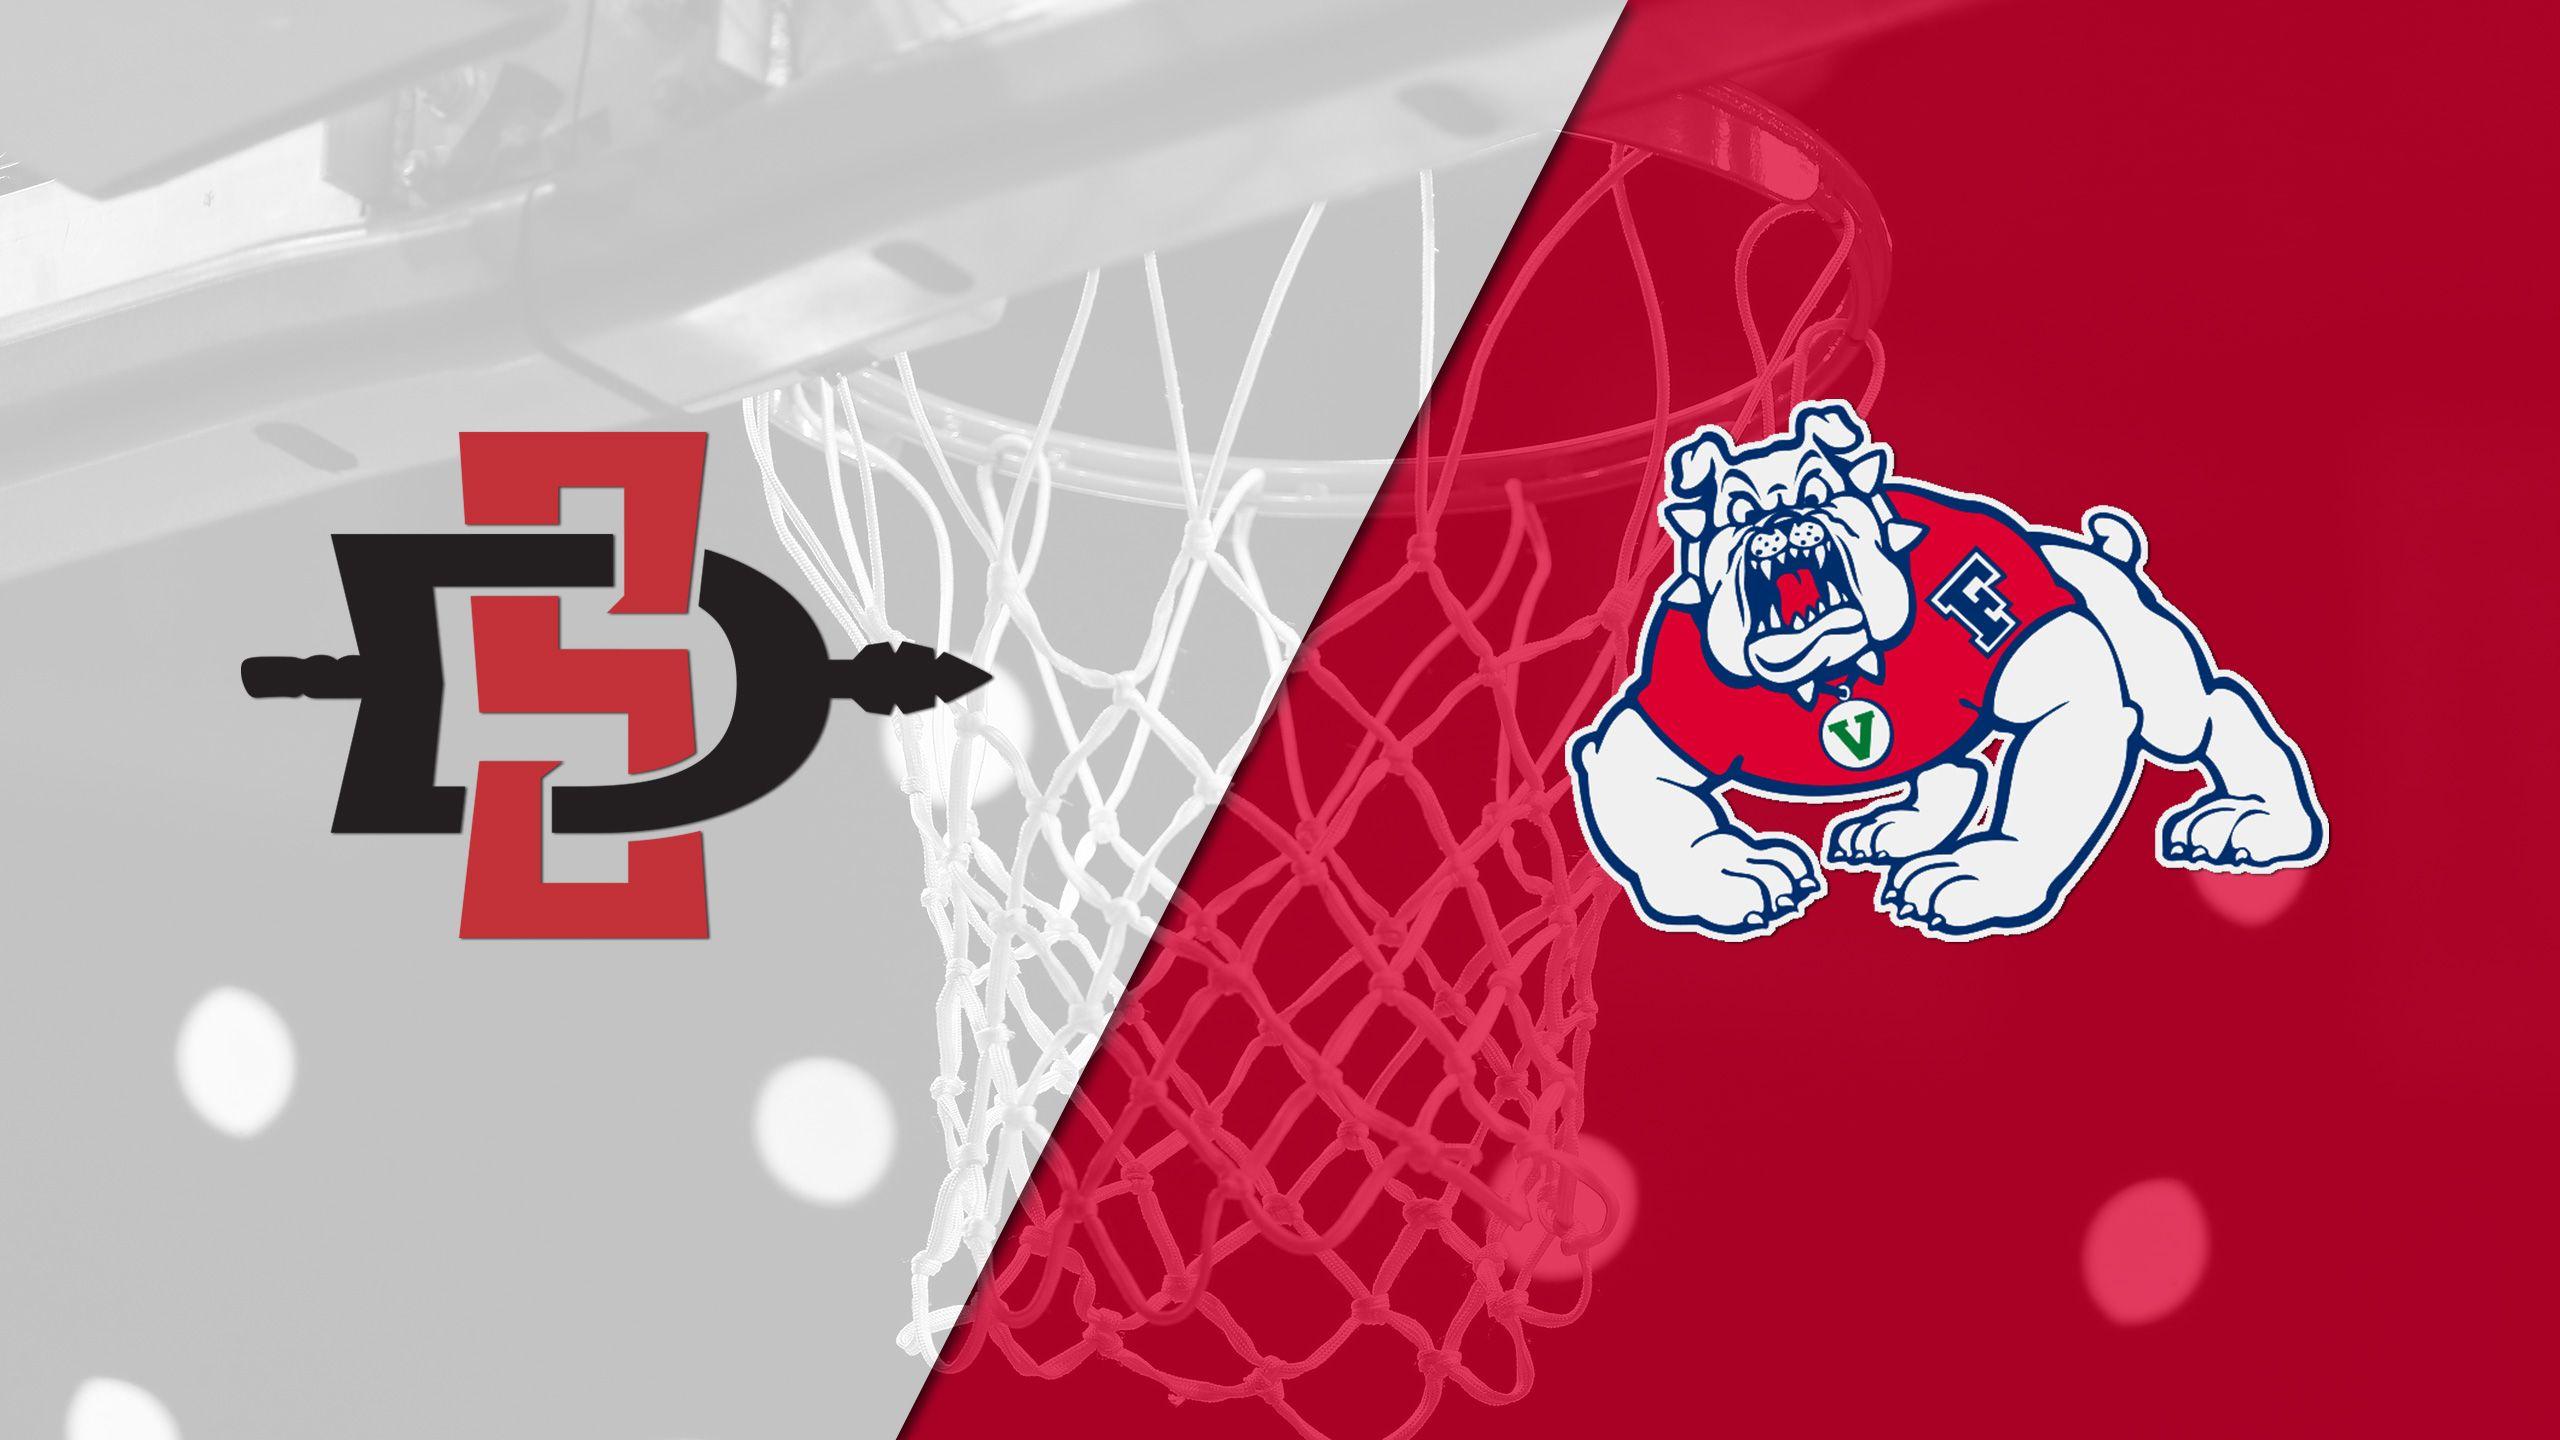 San Diego State vs. Fresno State (M Basketball)